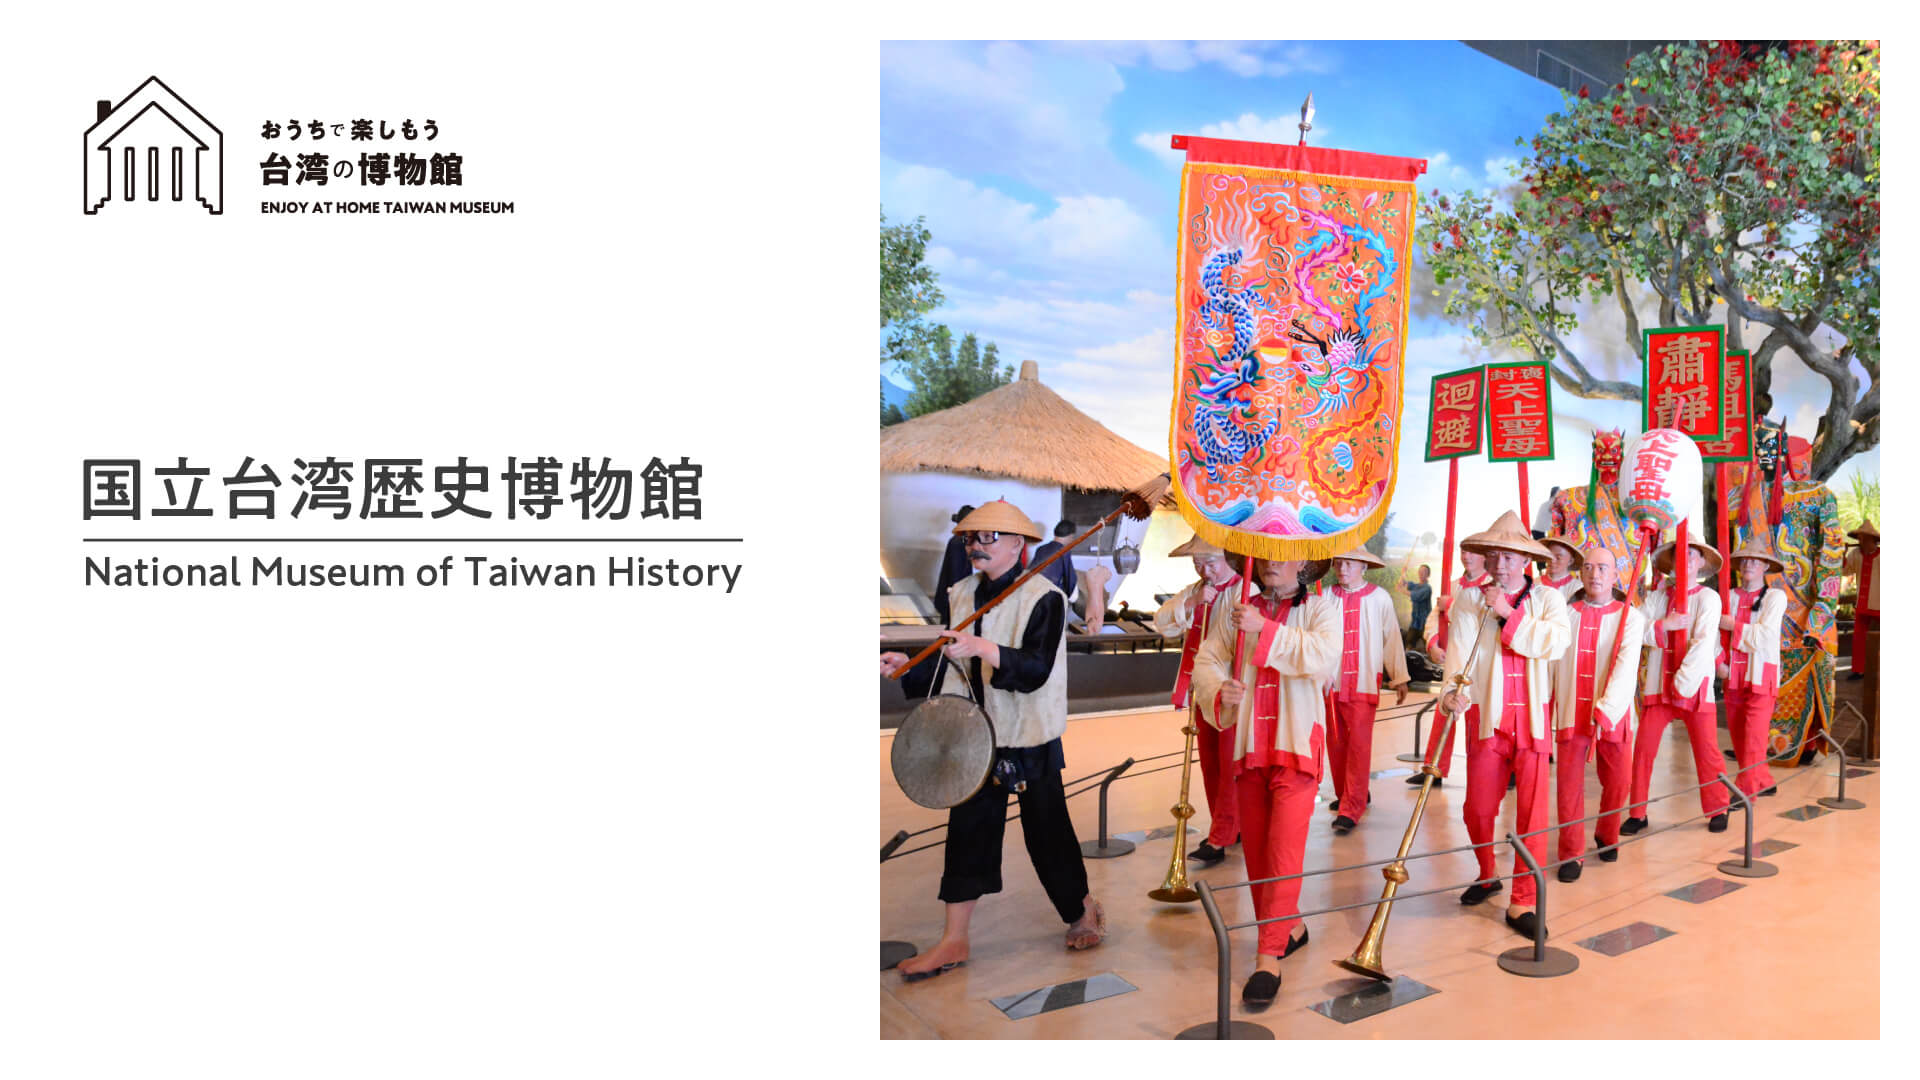 SNET台湾チャンネル『おうちで楽しもう台湾の博物館』第10回 国立台湾歴史博物館 配信